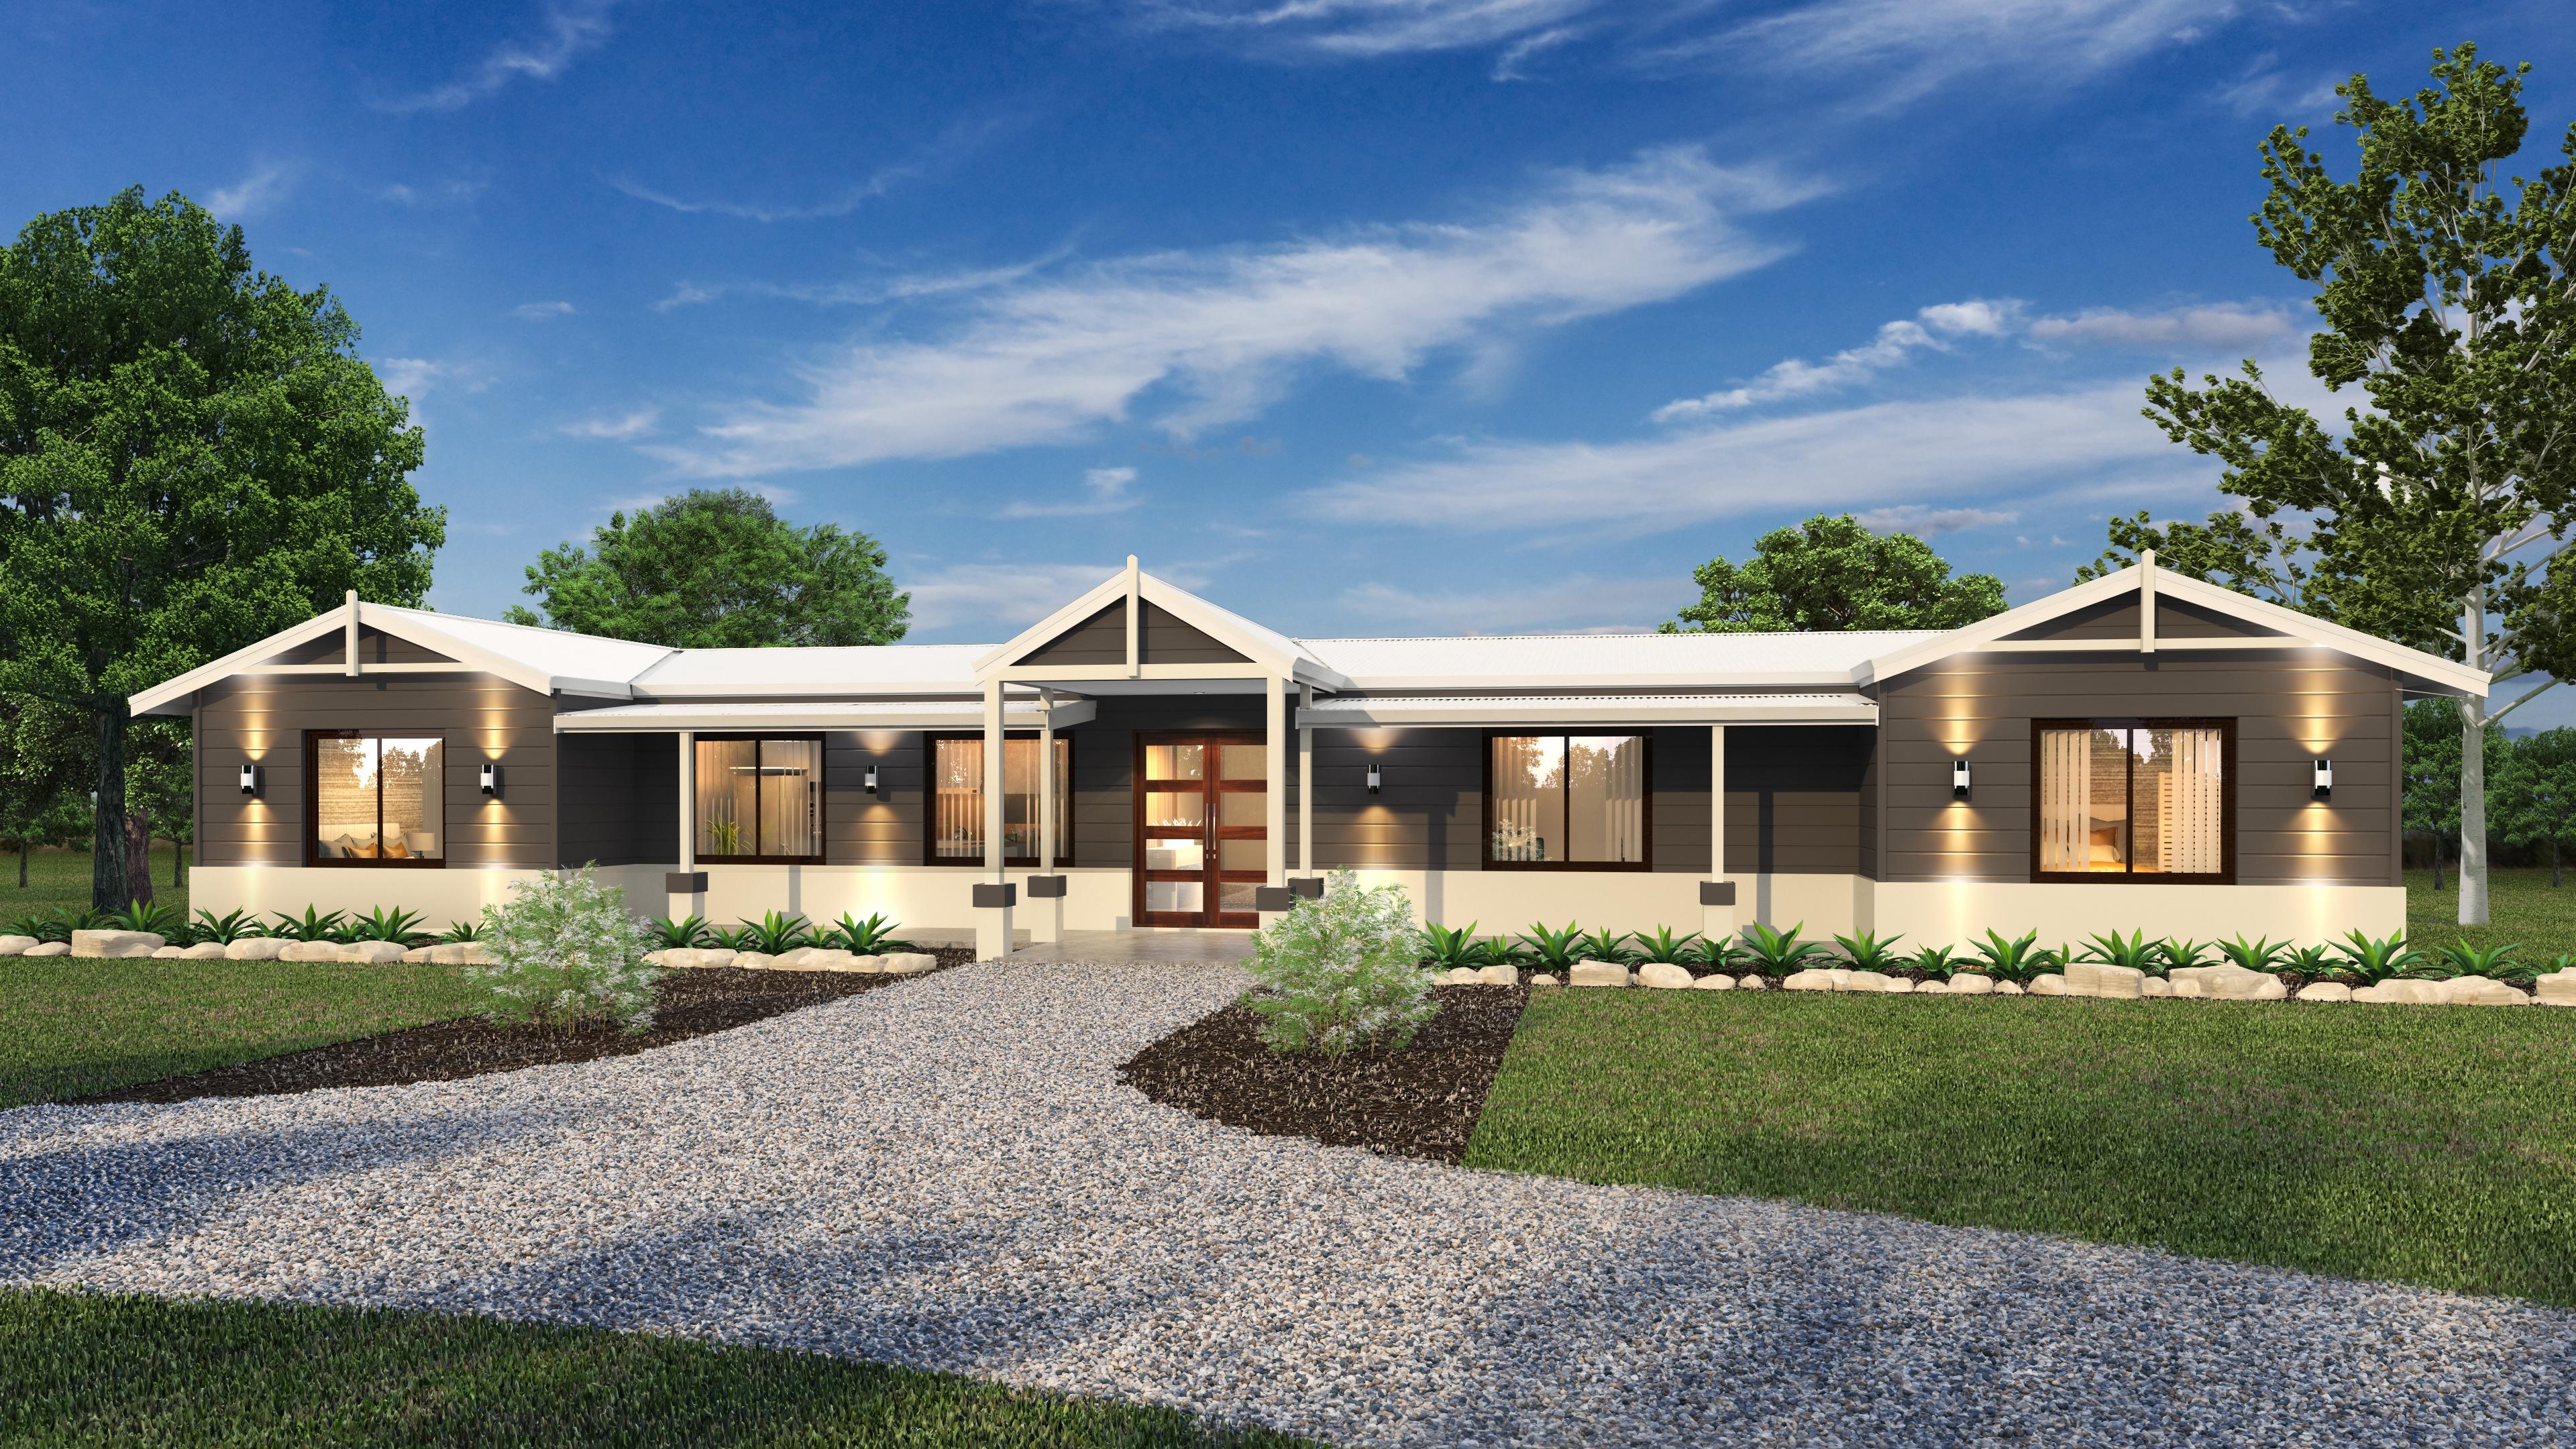 The Four Winds Home Design   Evoke Living Homes